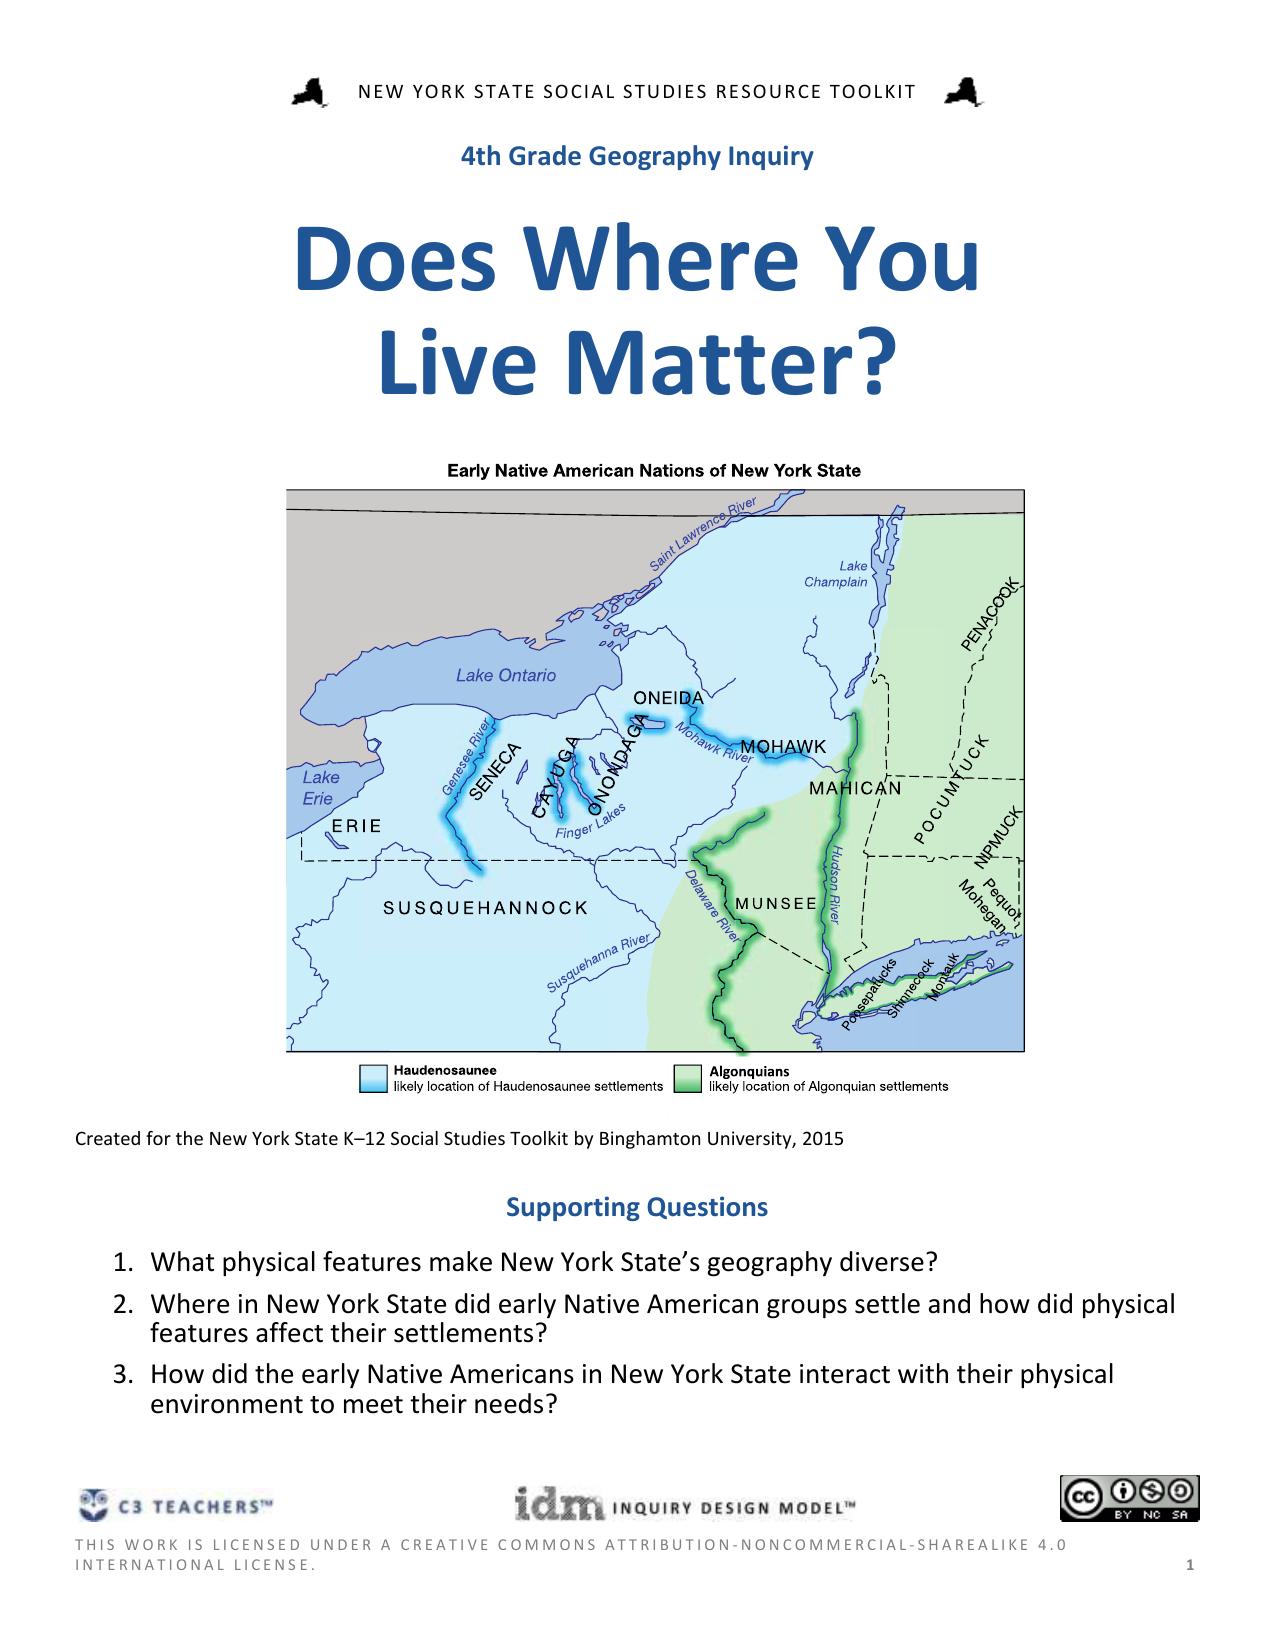 Map Of New York State 4th Grade.Doc C3 Teachers